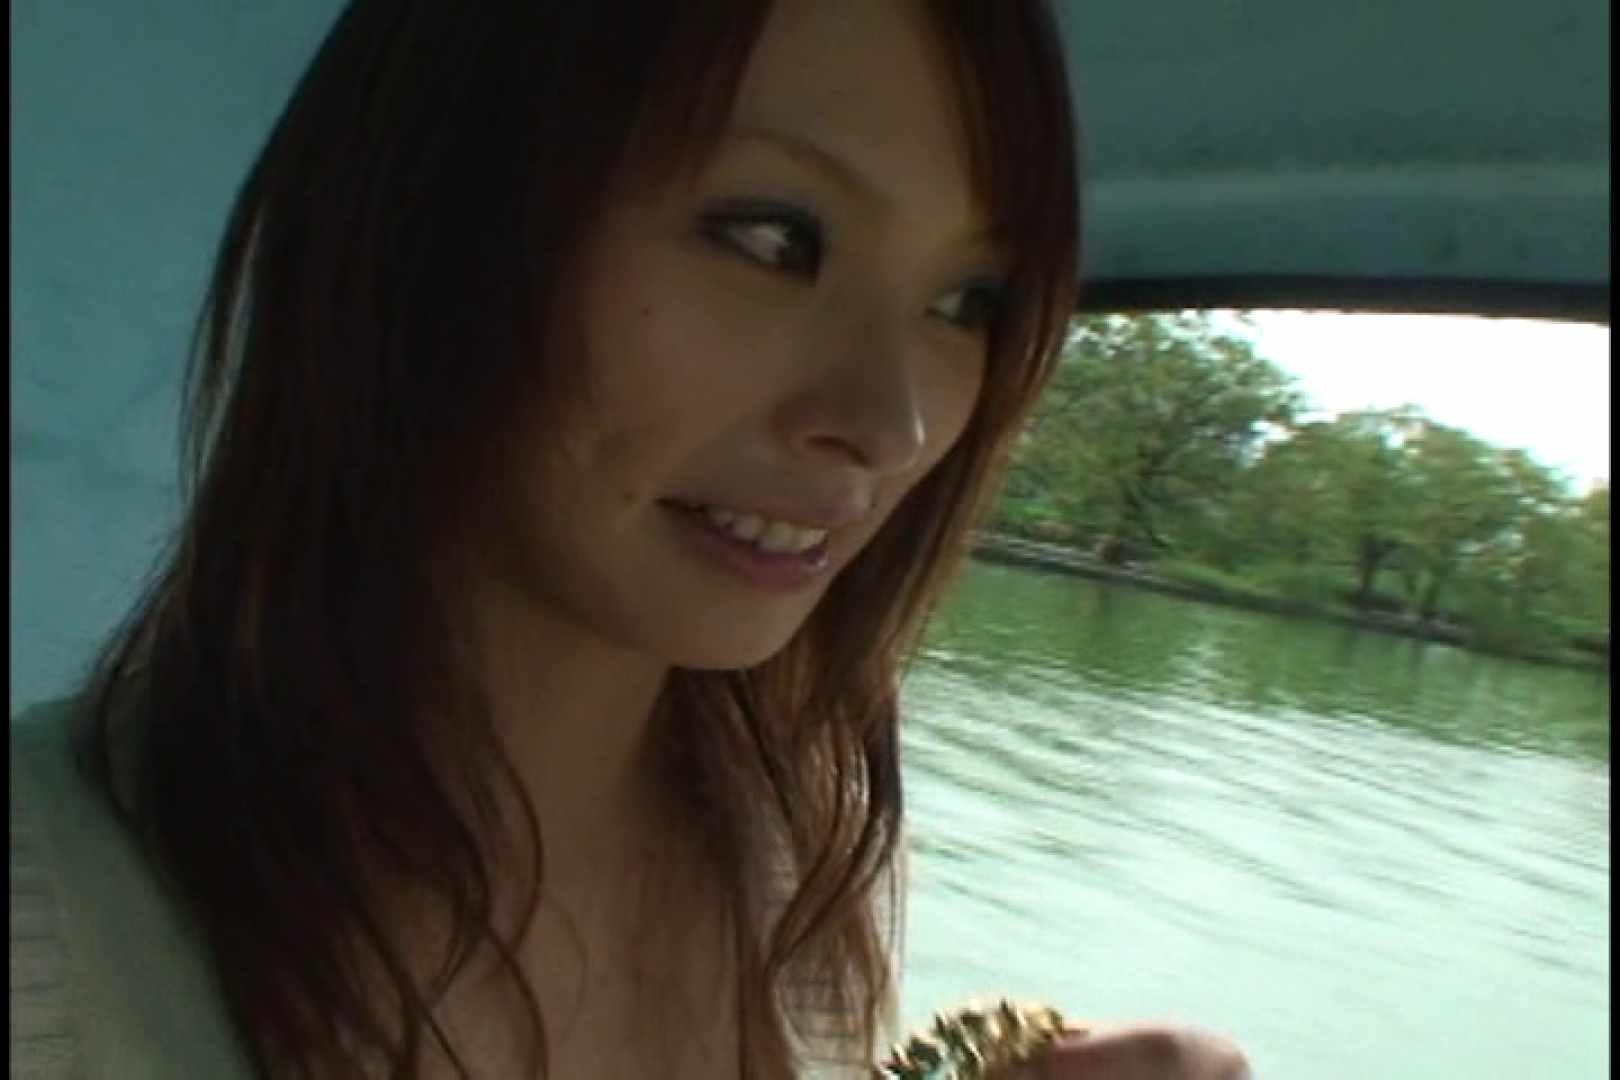 JDハンター全国ツアー vol.031 前編 女子大生のエロ動画 | 0  97PIX 29